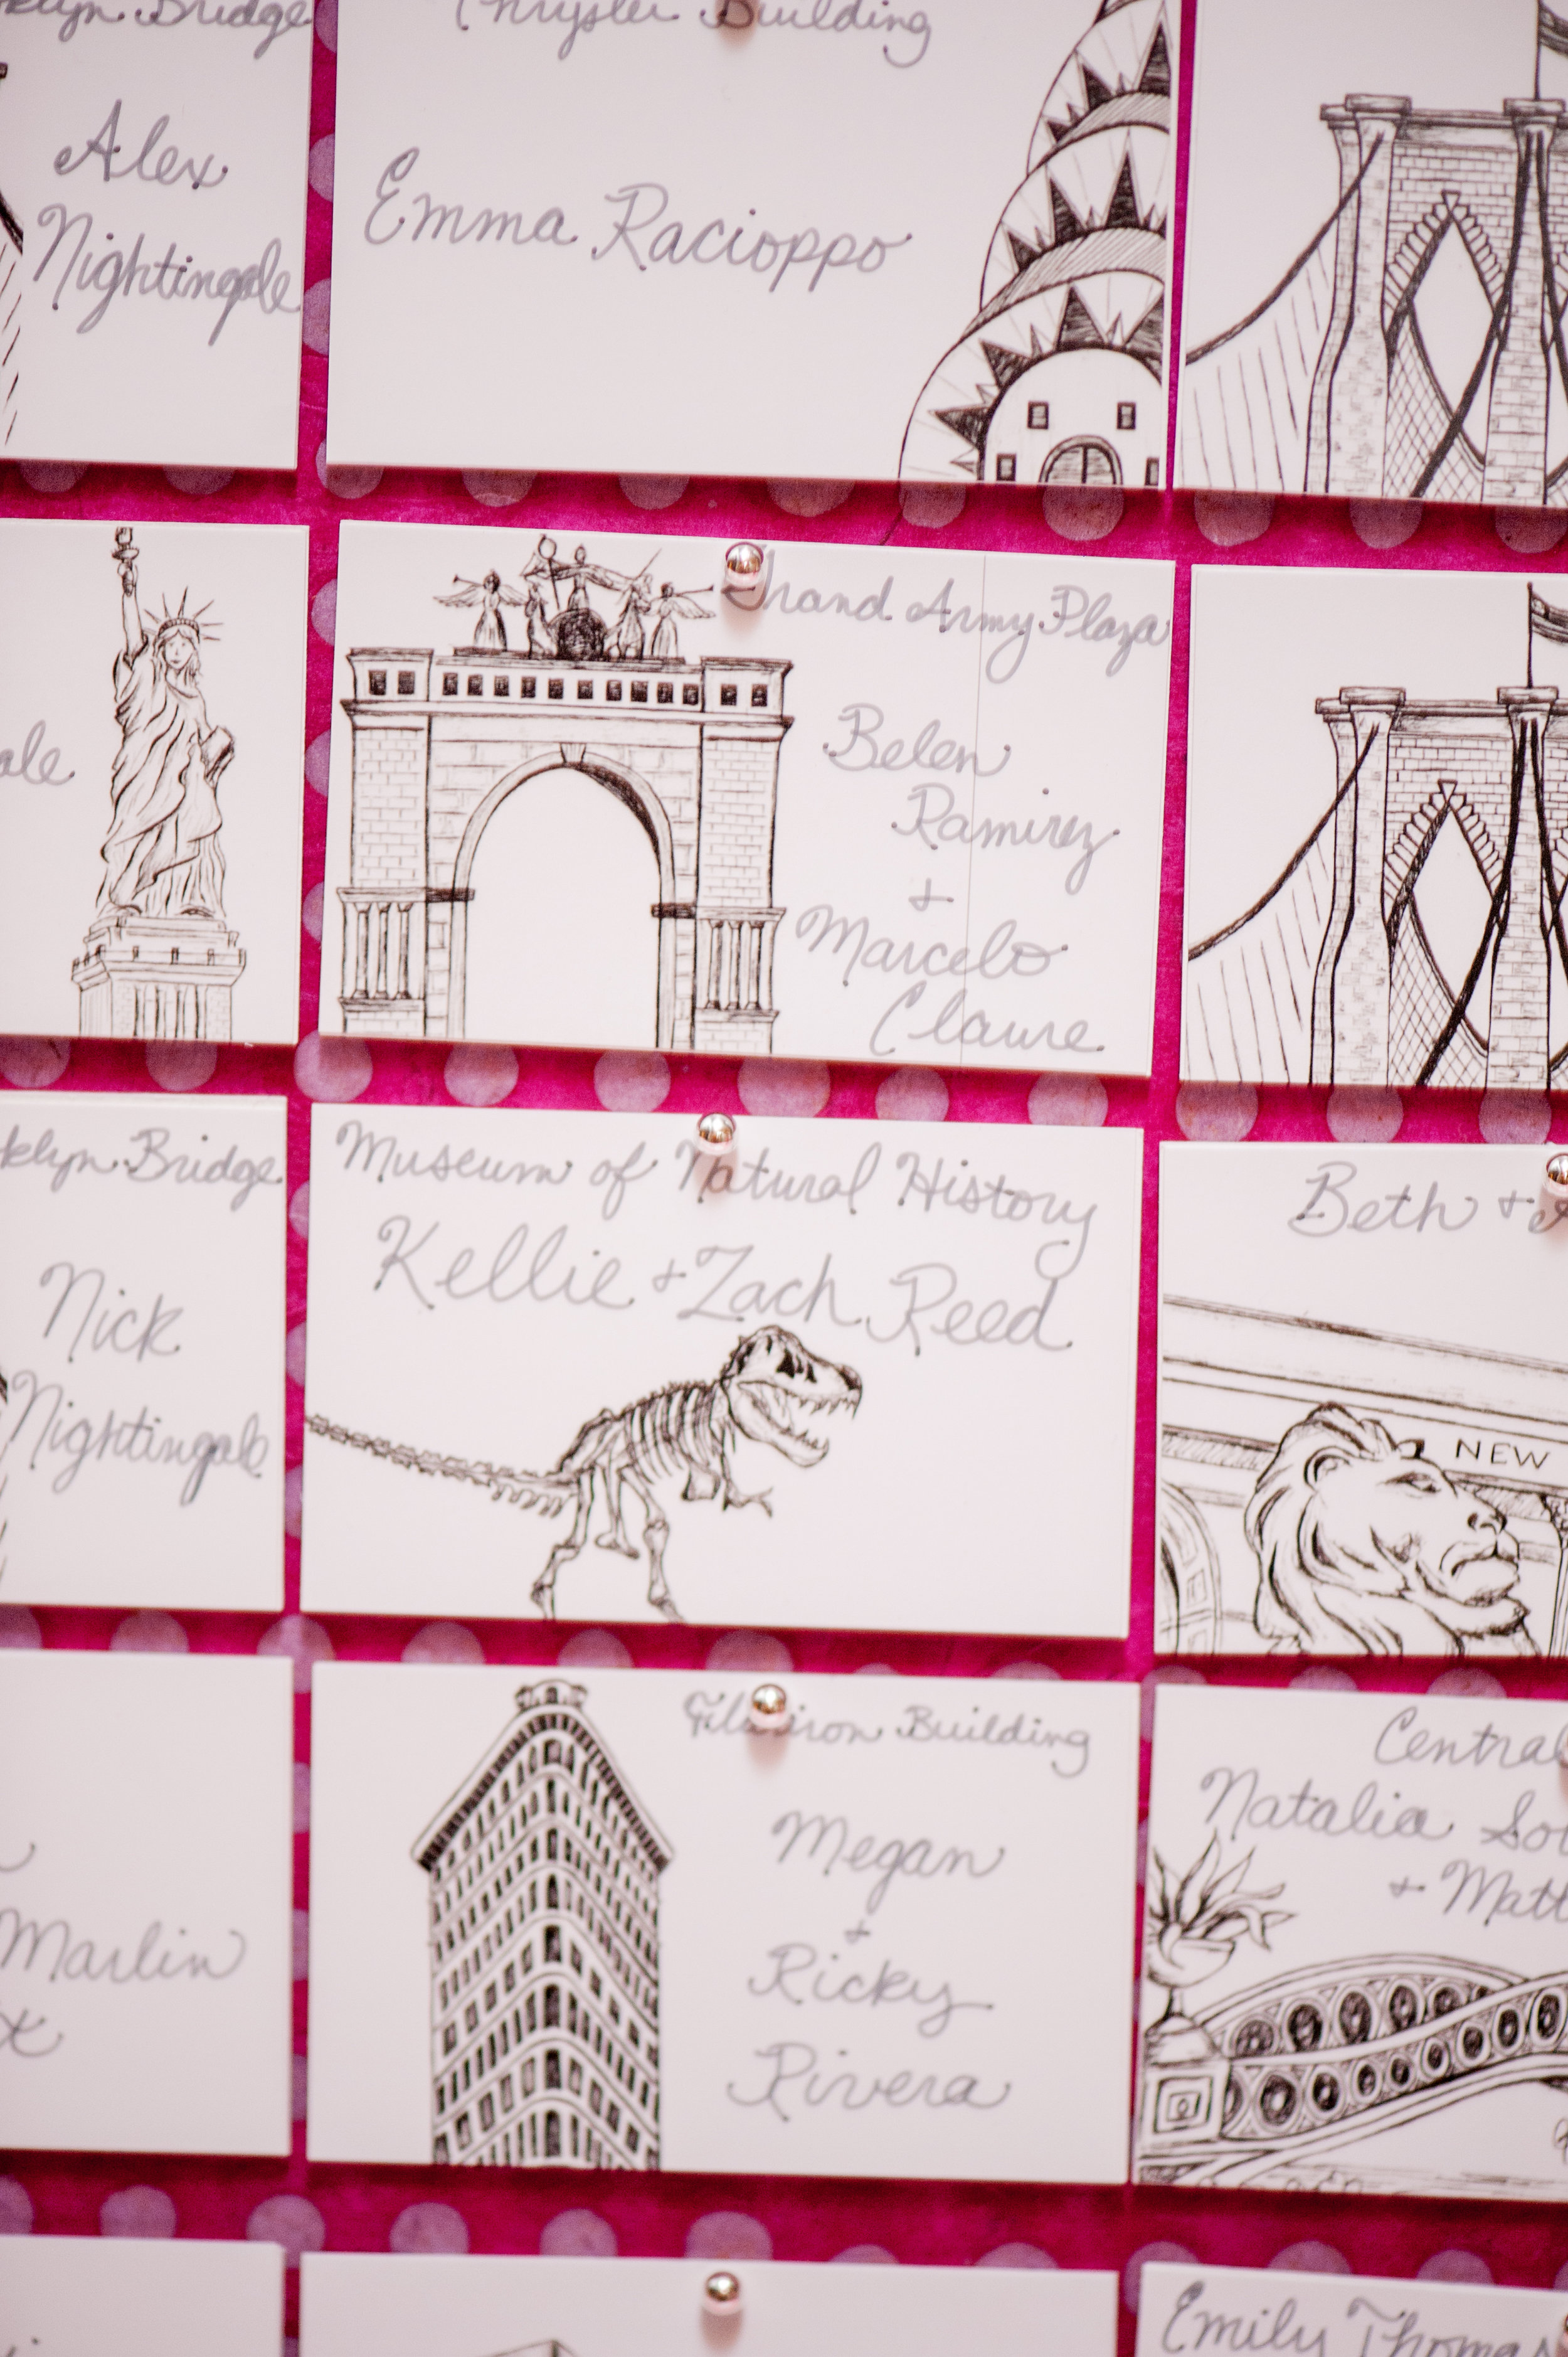 Pineapple Street Designs Stationery Illustrations for Weddings (28).jpg